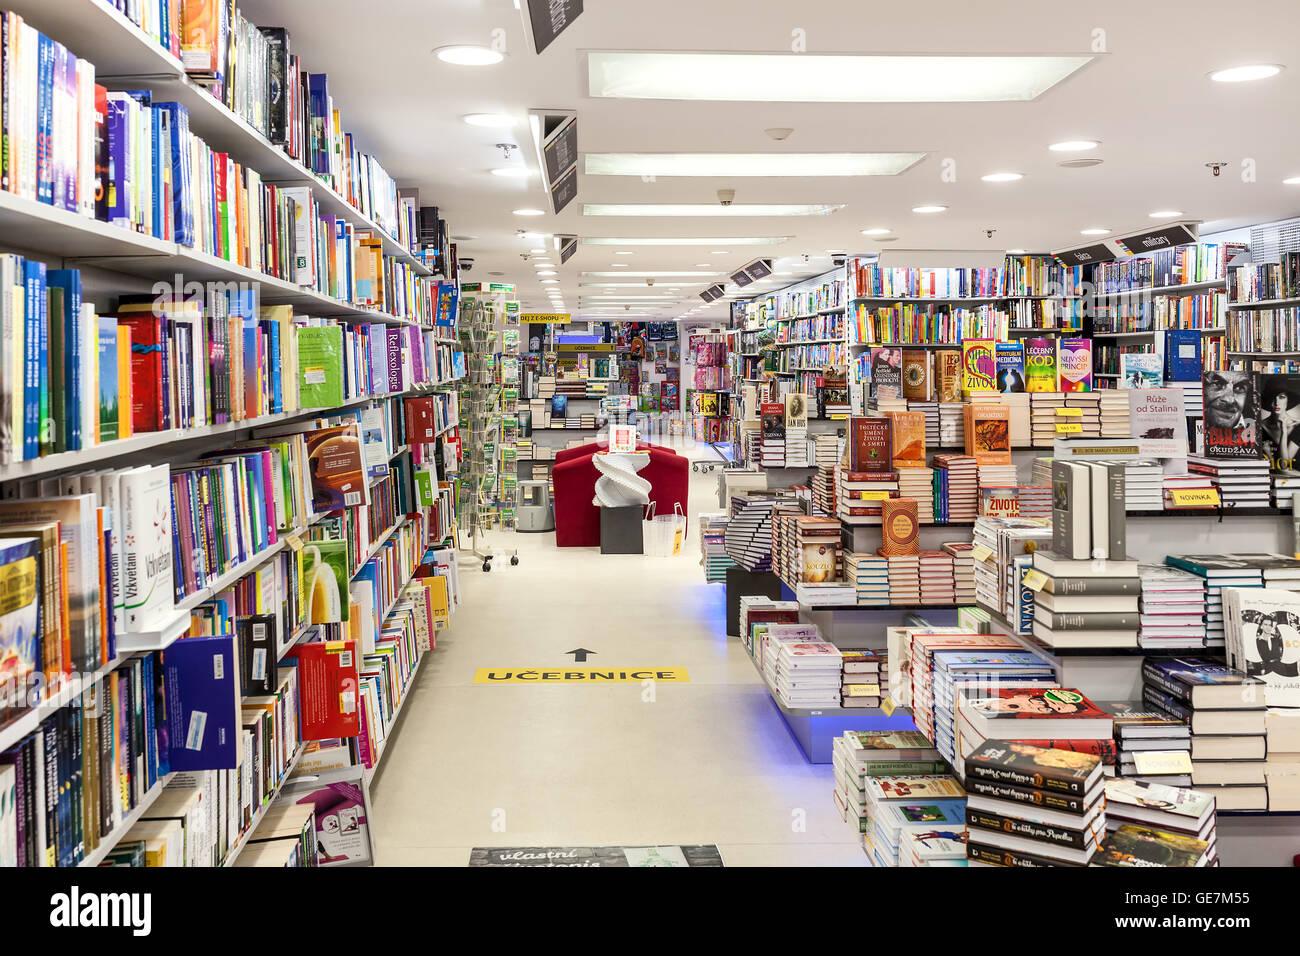 Interior view of Dobrovsky bookstore located on Wenceslas Square in Prague. - Stock Image